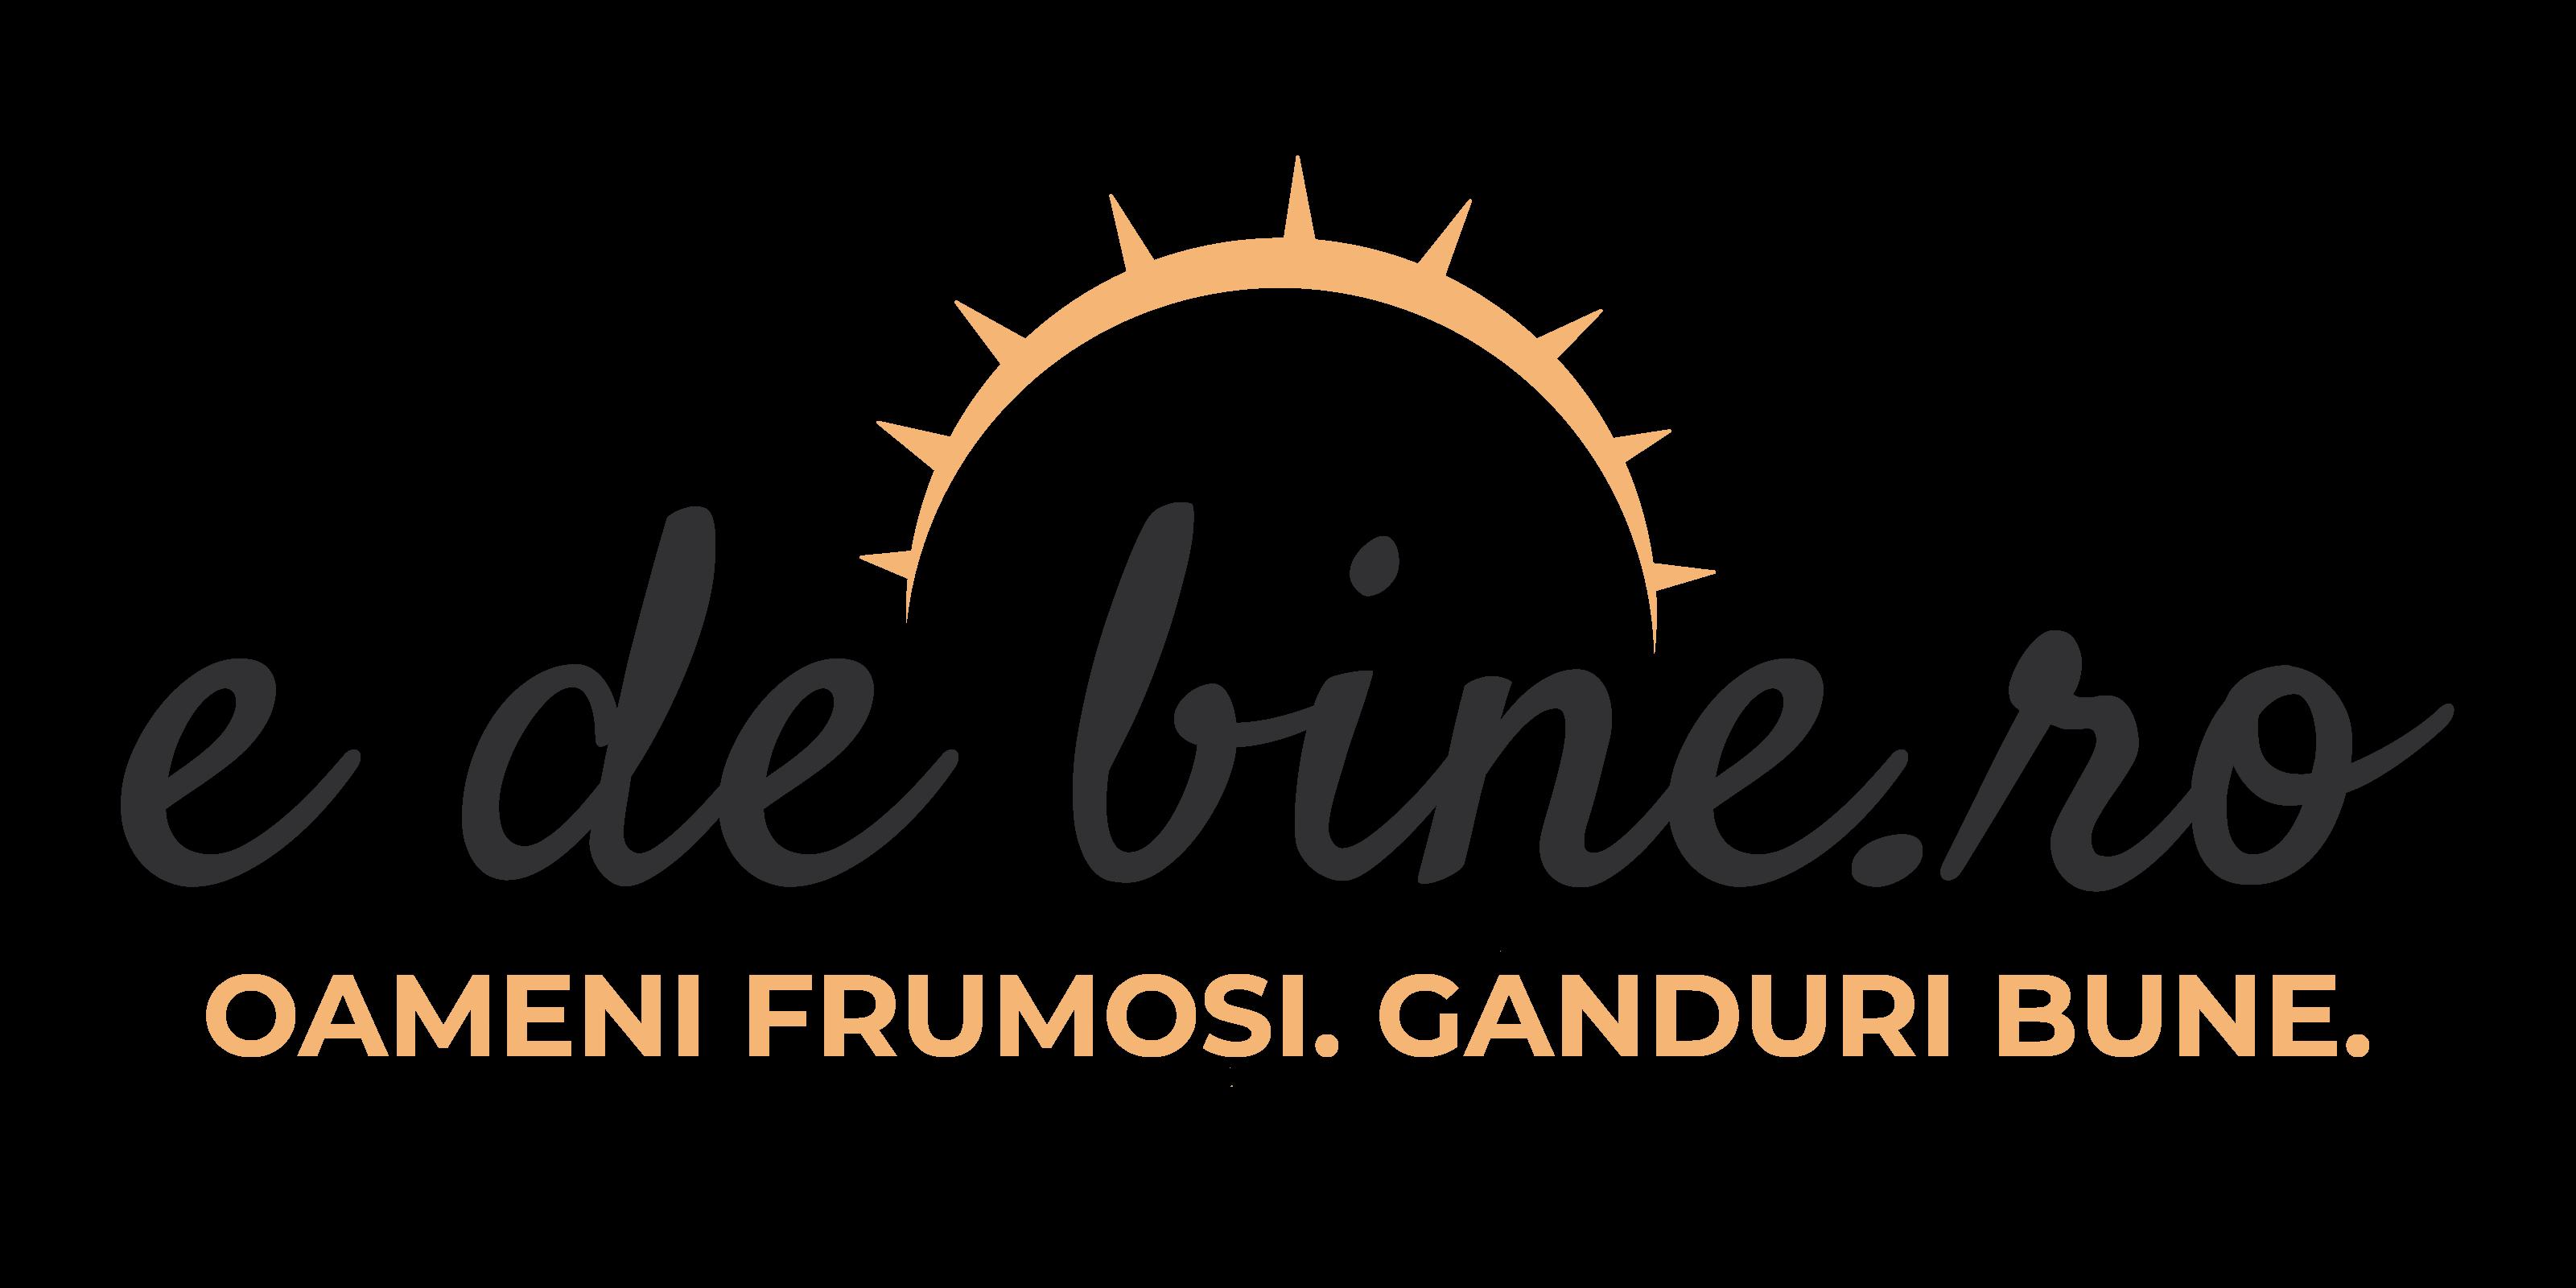 logo edebine.ro